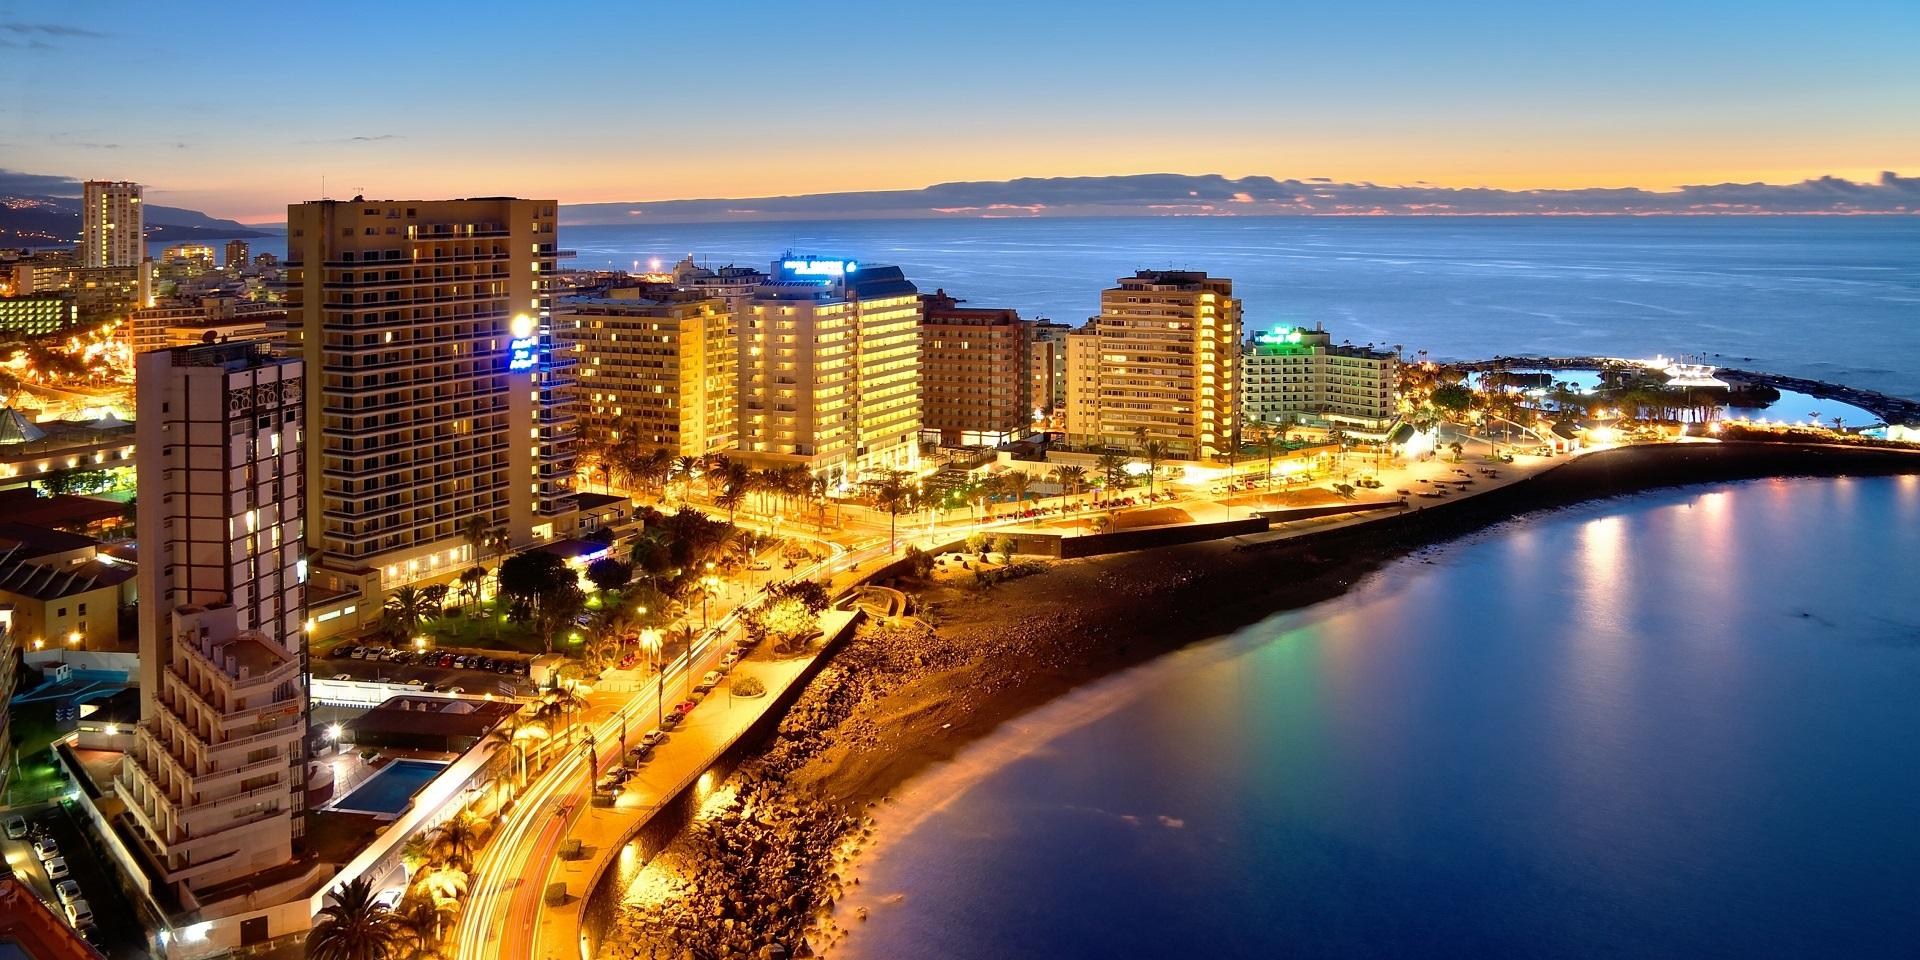 DMC Tenerife